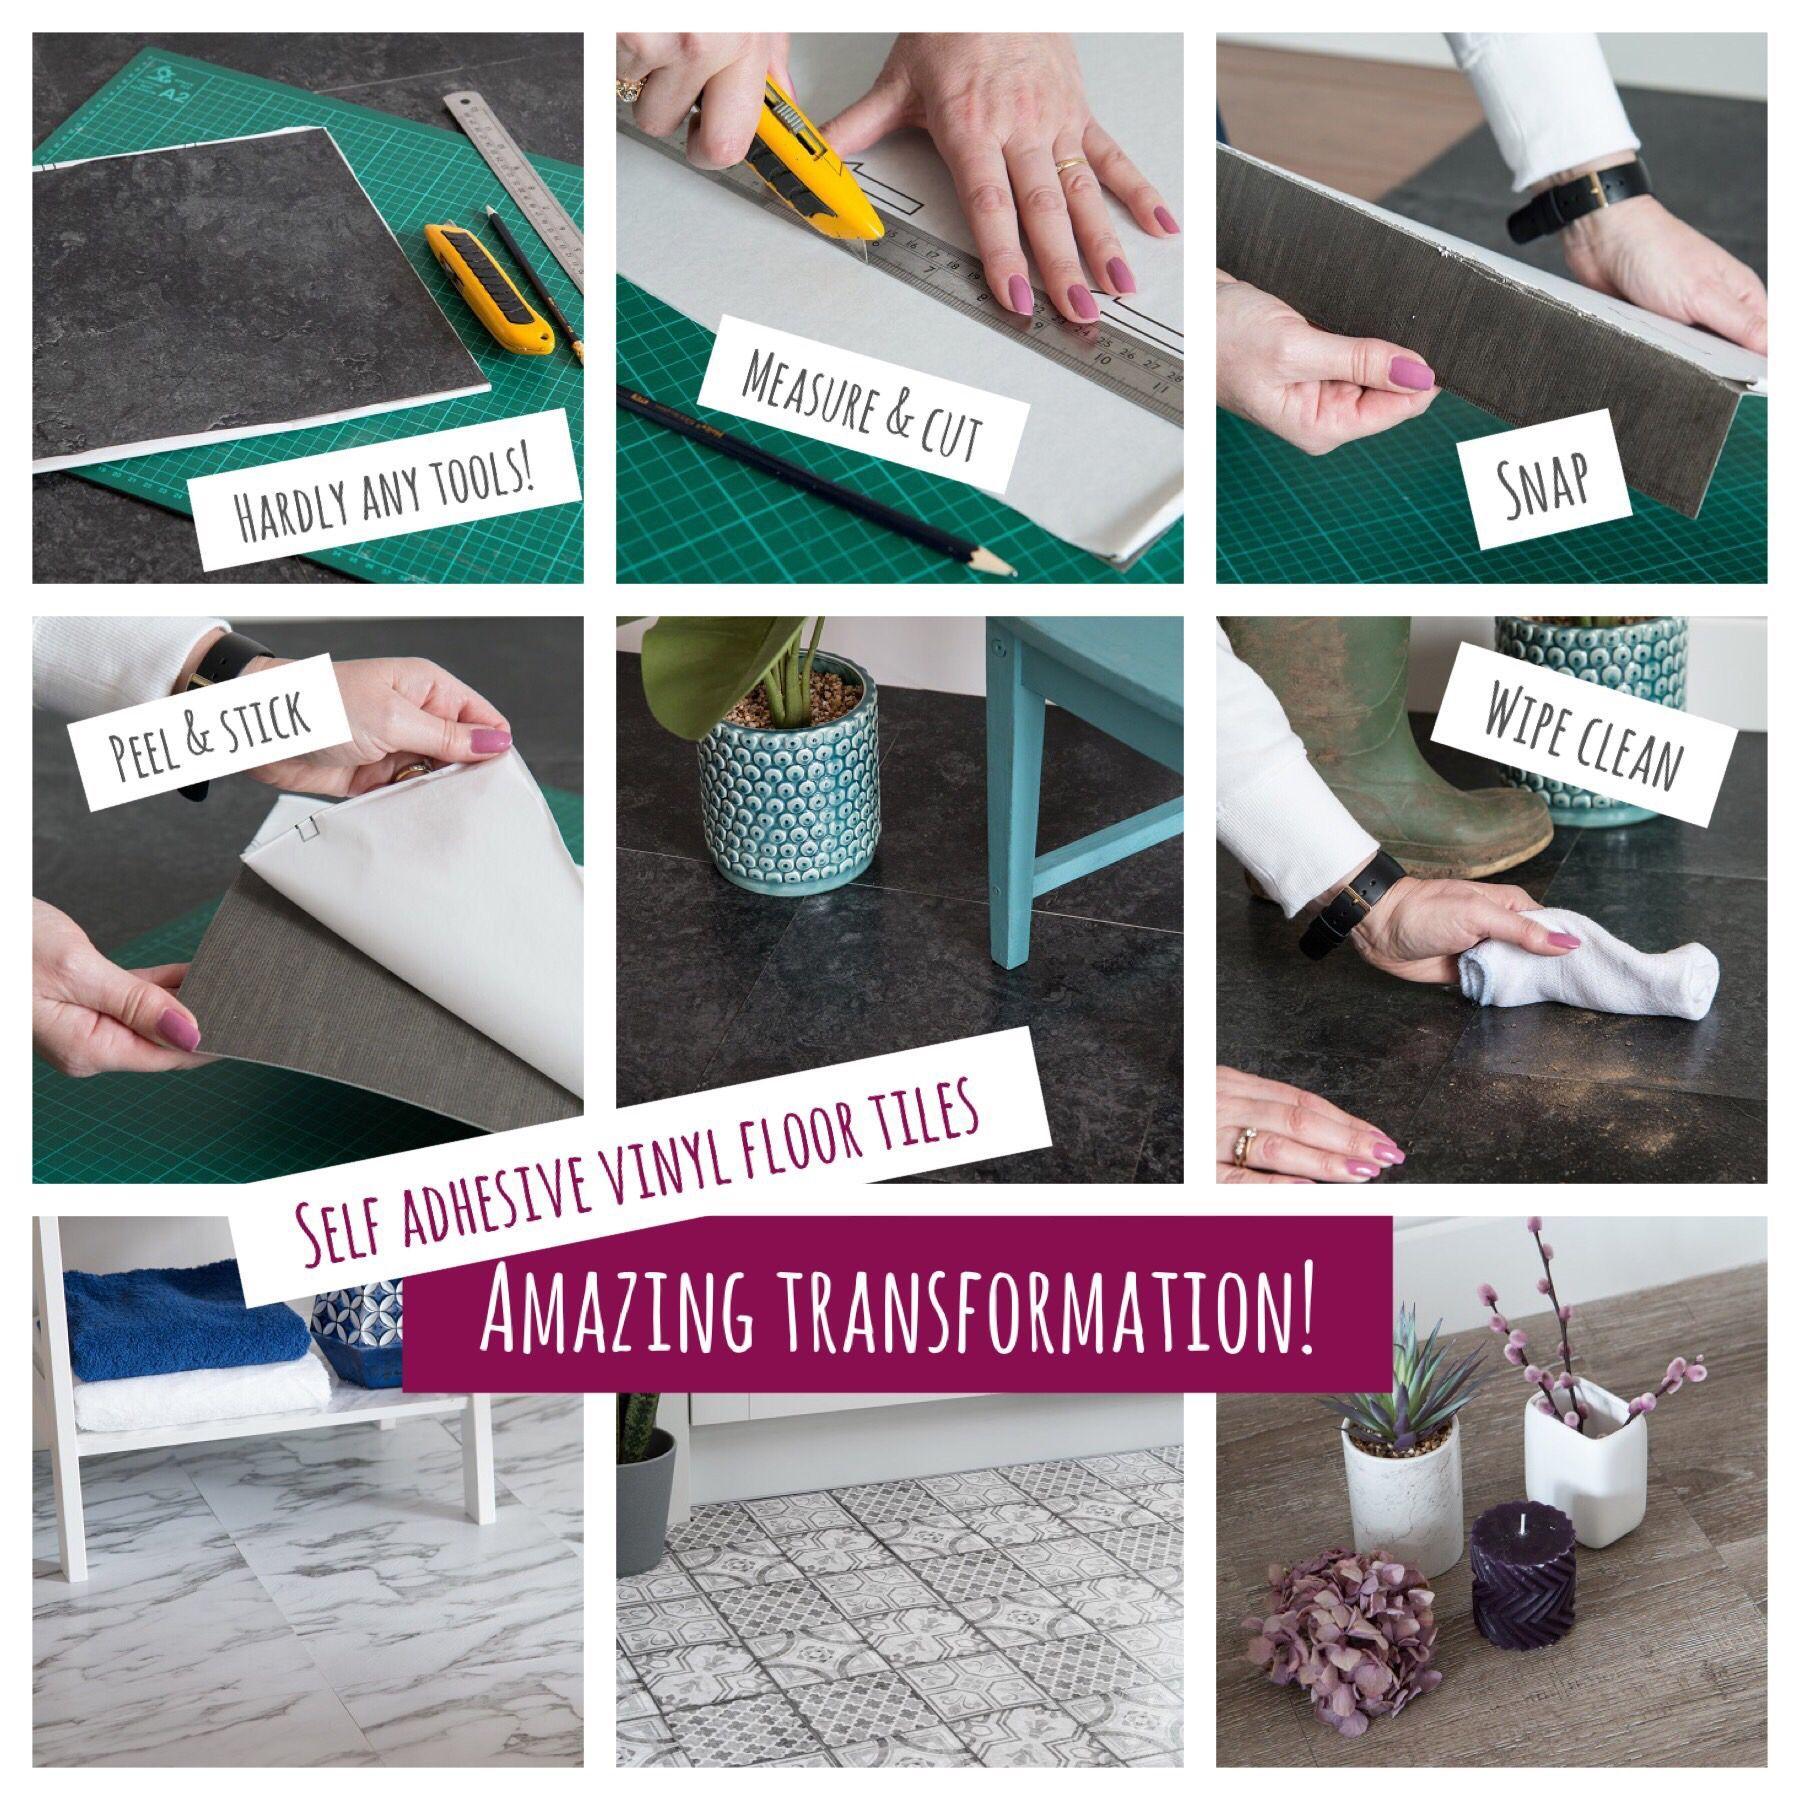 Self Adhesive Vinyl Floor Tiles Floor Selfadhesive Tiles Vinyl I 2020